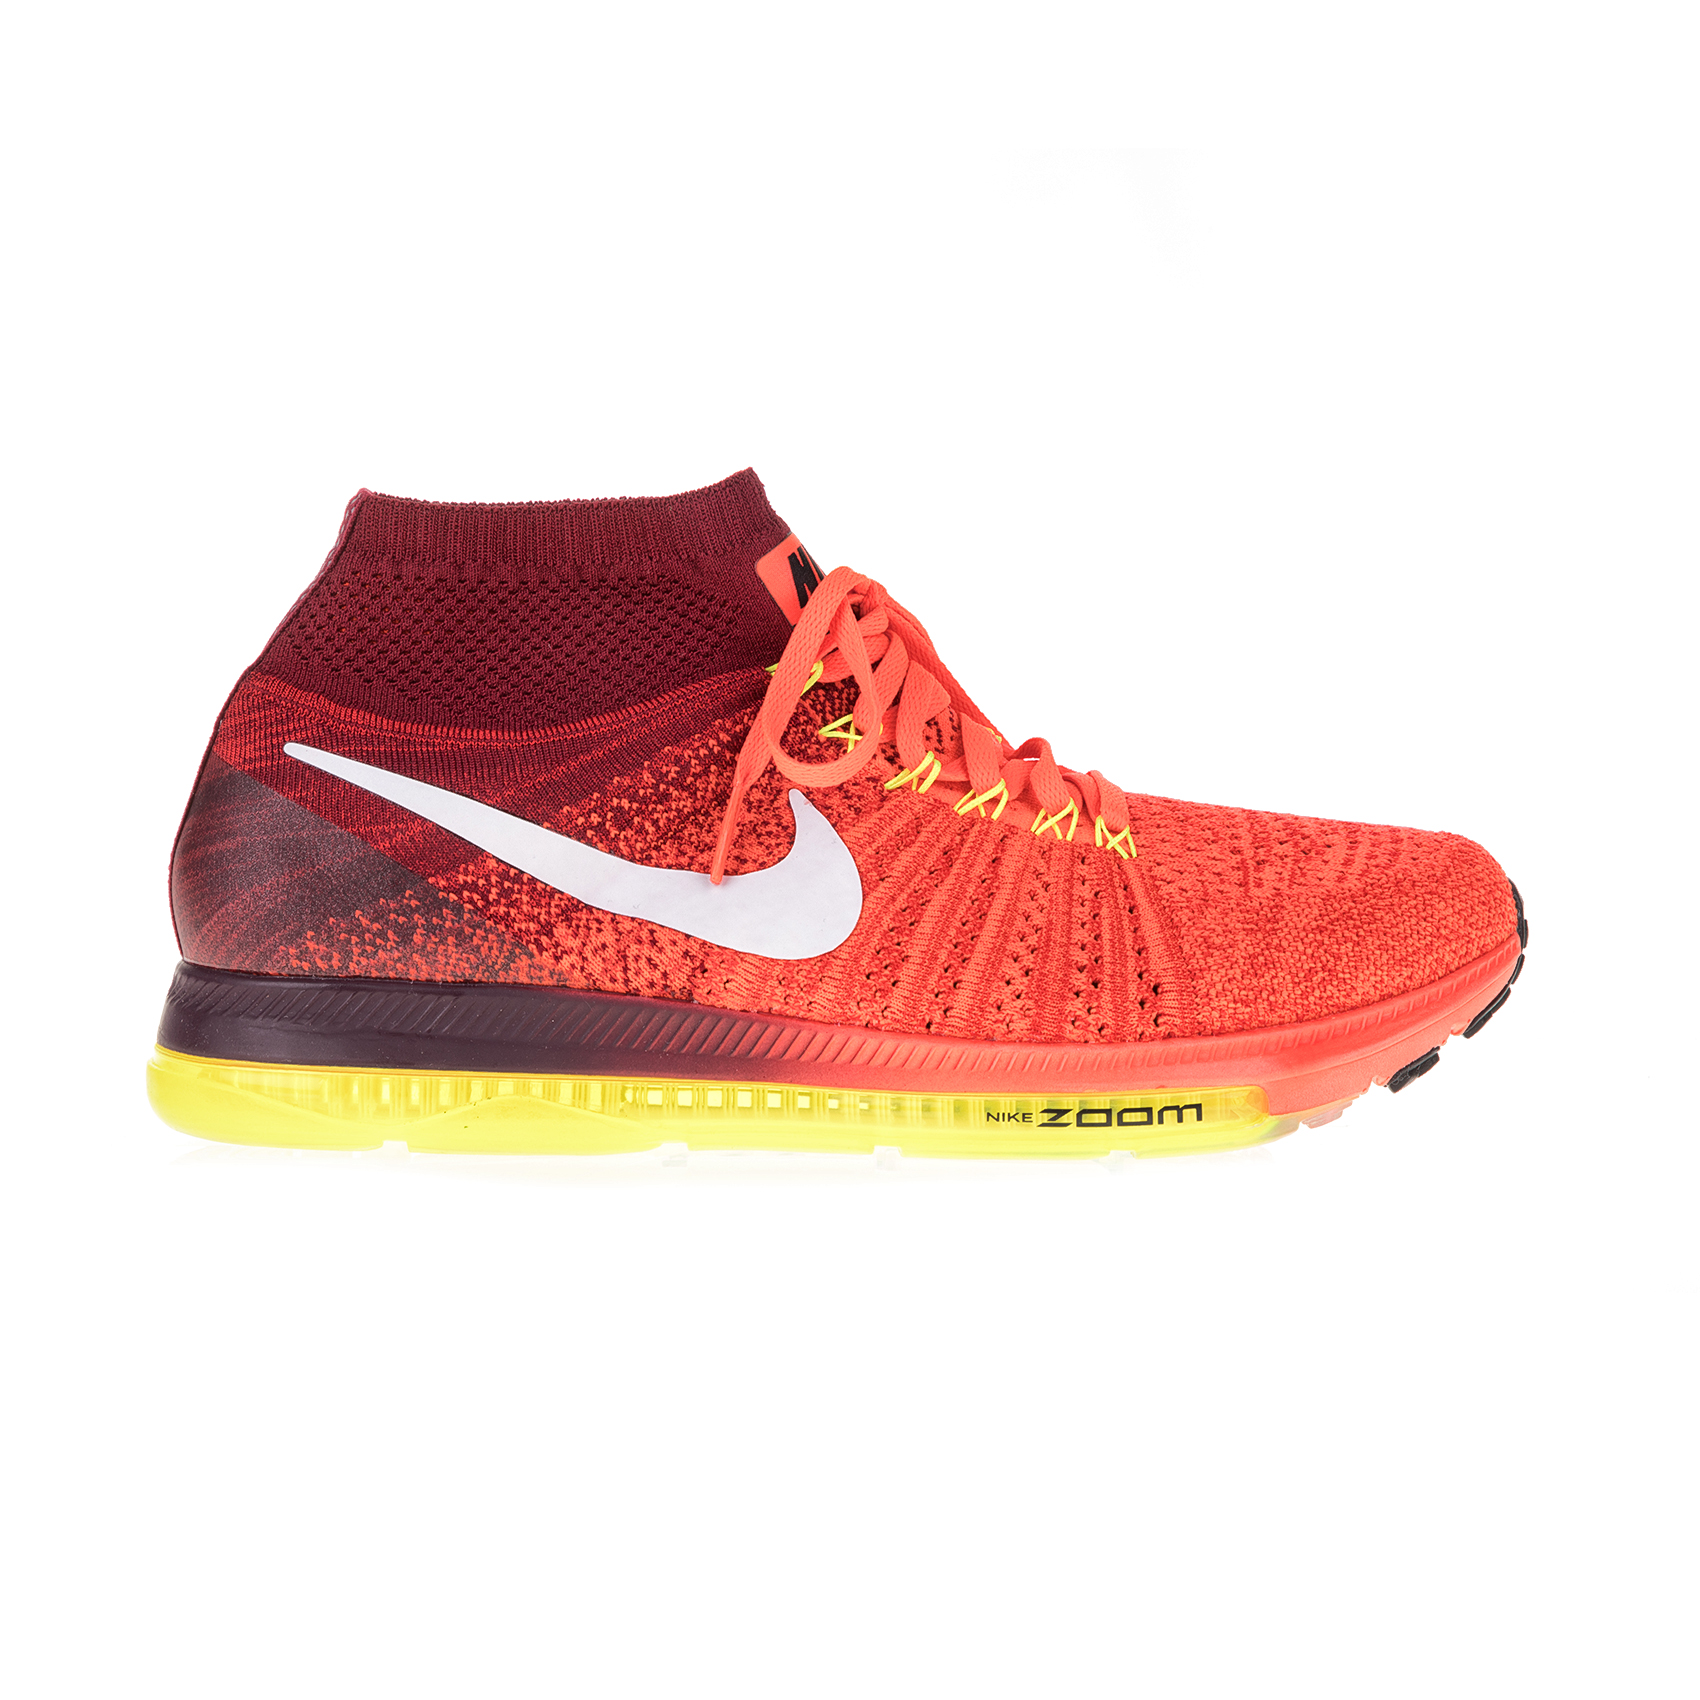 best website 38844 f697c NIKE – Γυναικεία αθλητικά παπούτσια NIKE ZOOM ALL OUT FLYKNIT  πορτοκαλί-κόκκινα